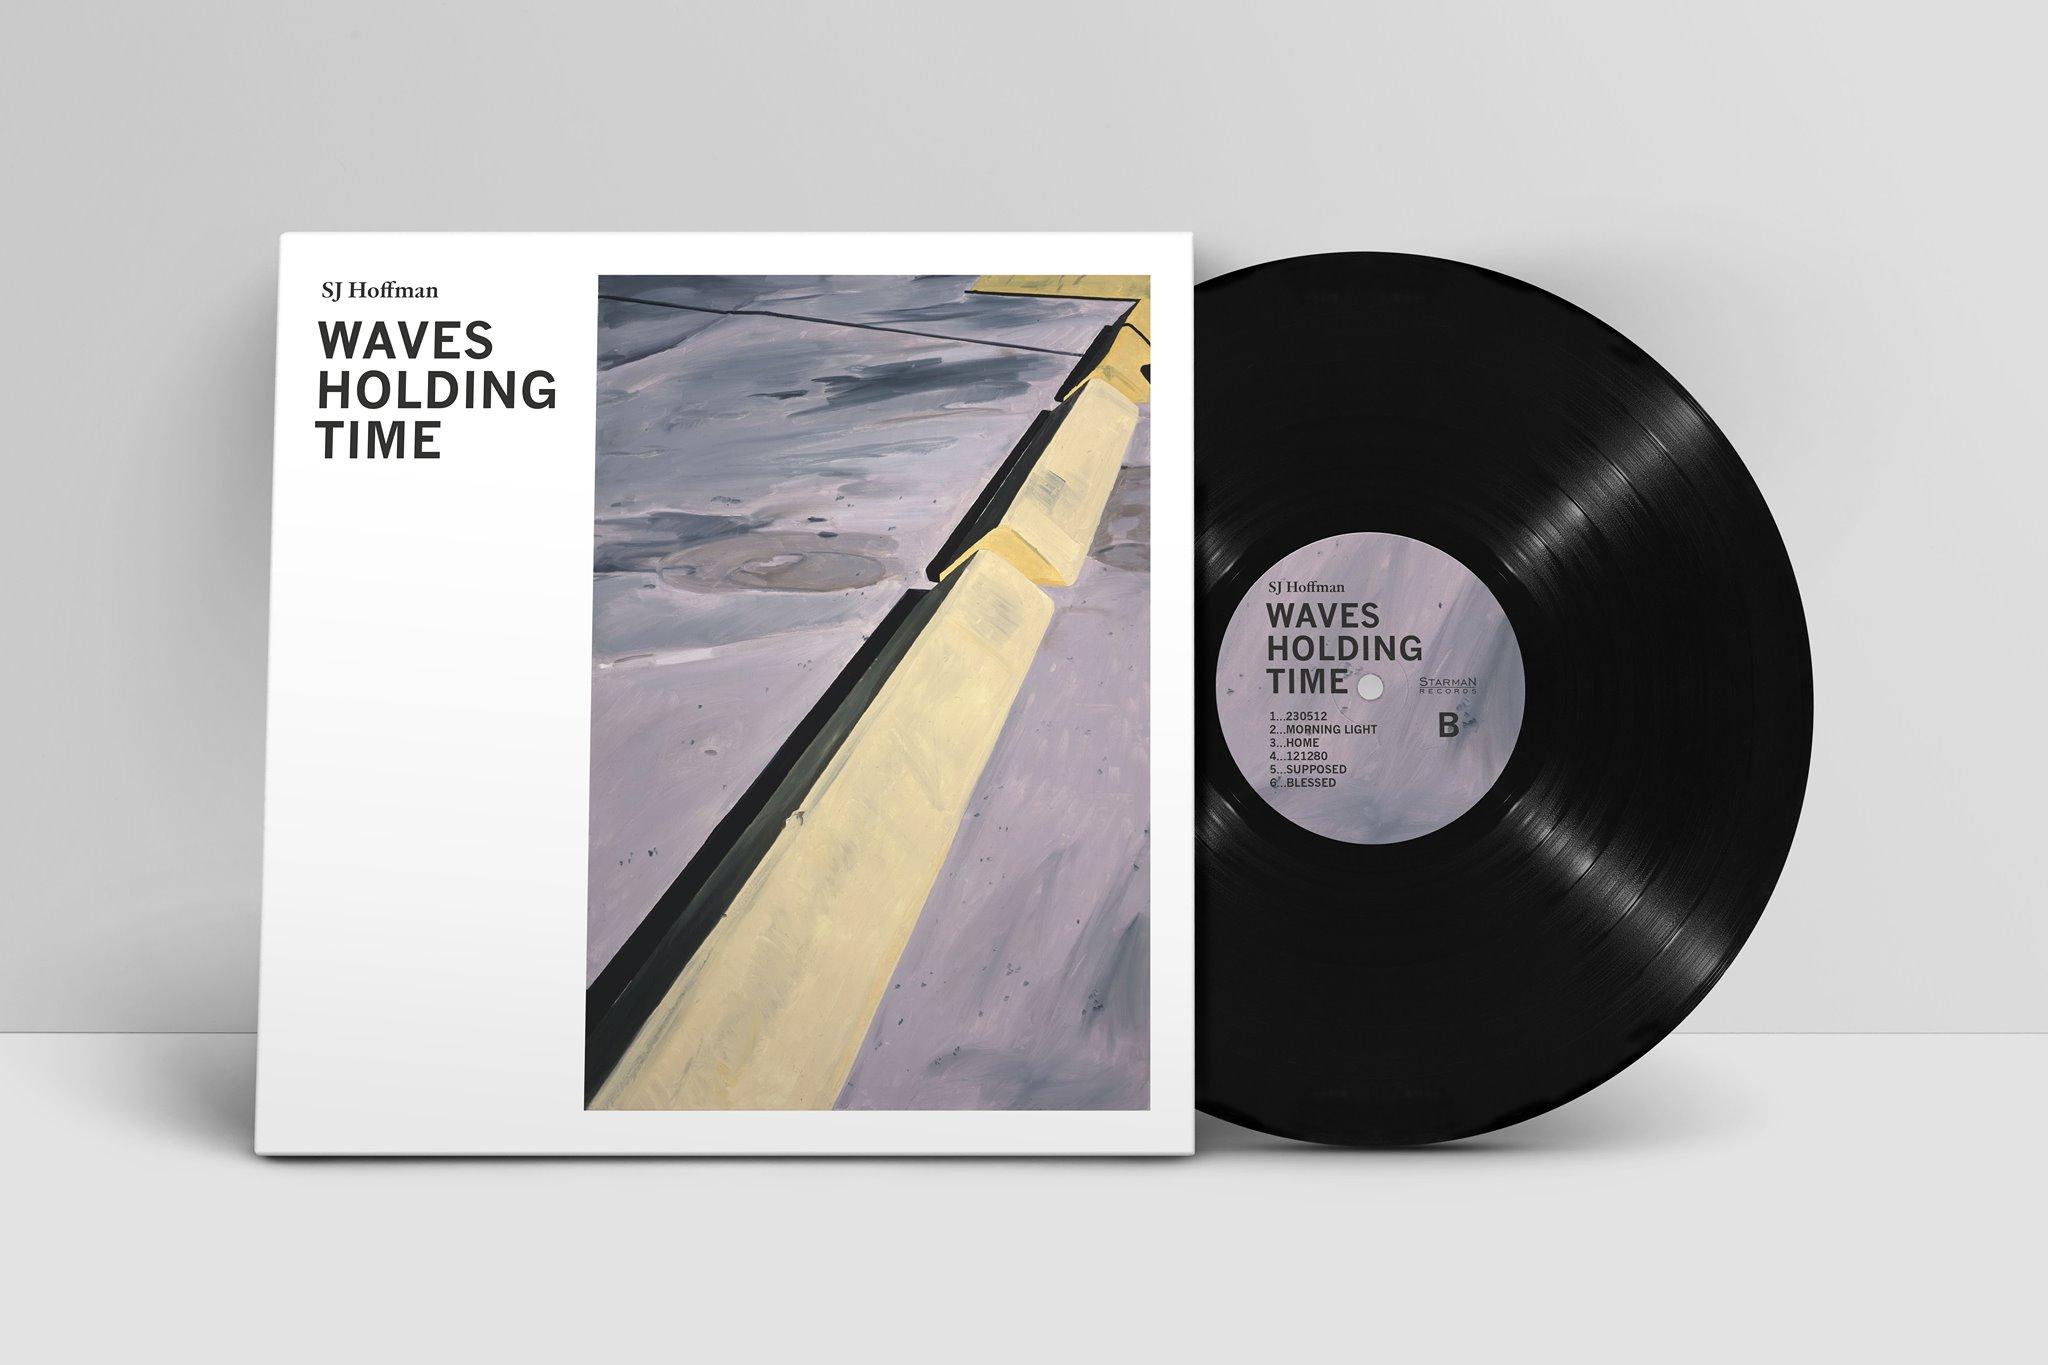 SJ Hoffman - Waves Holding Time